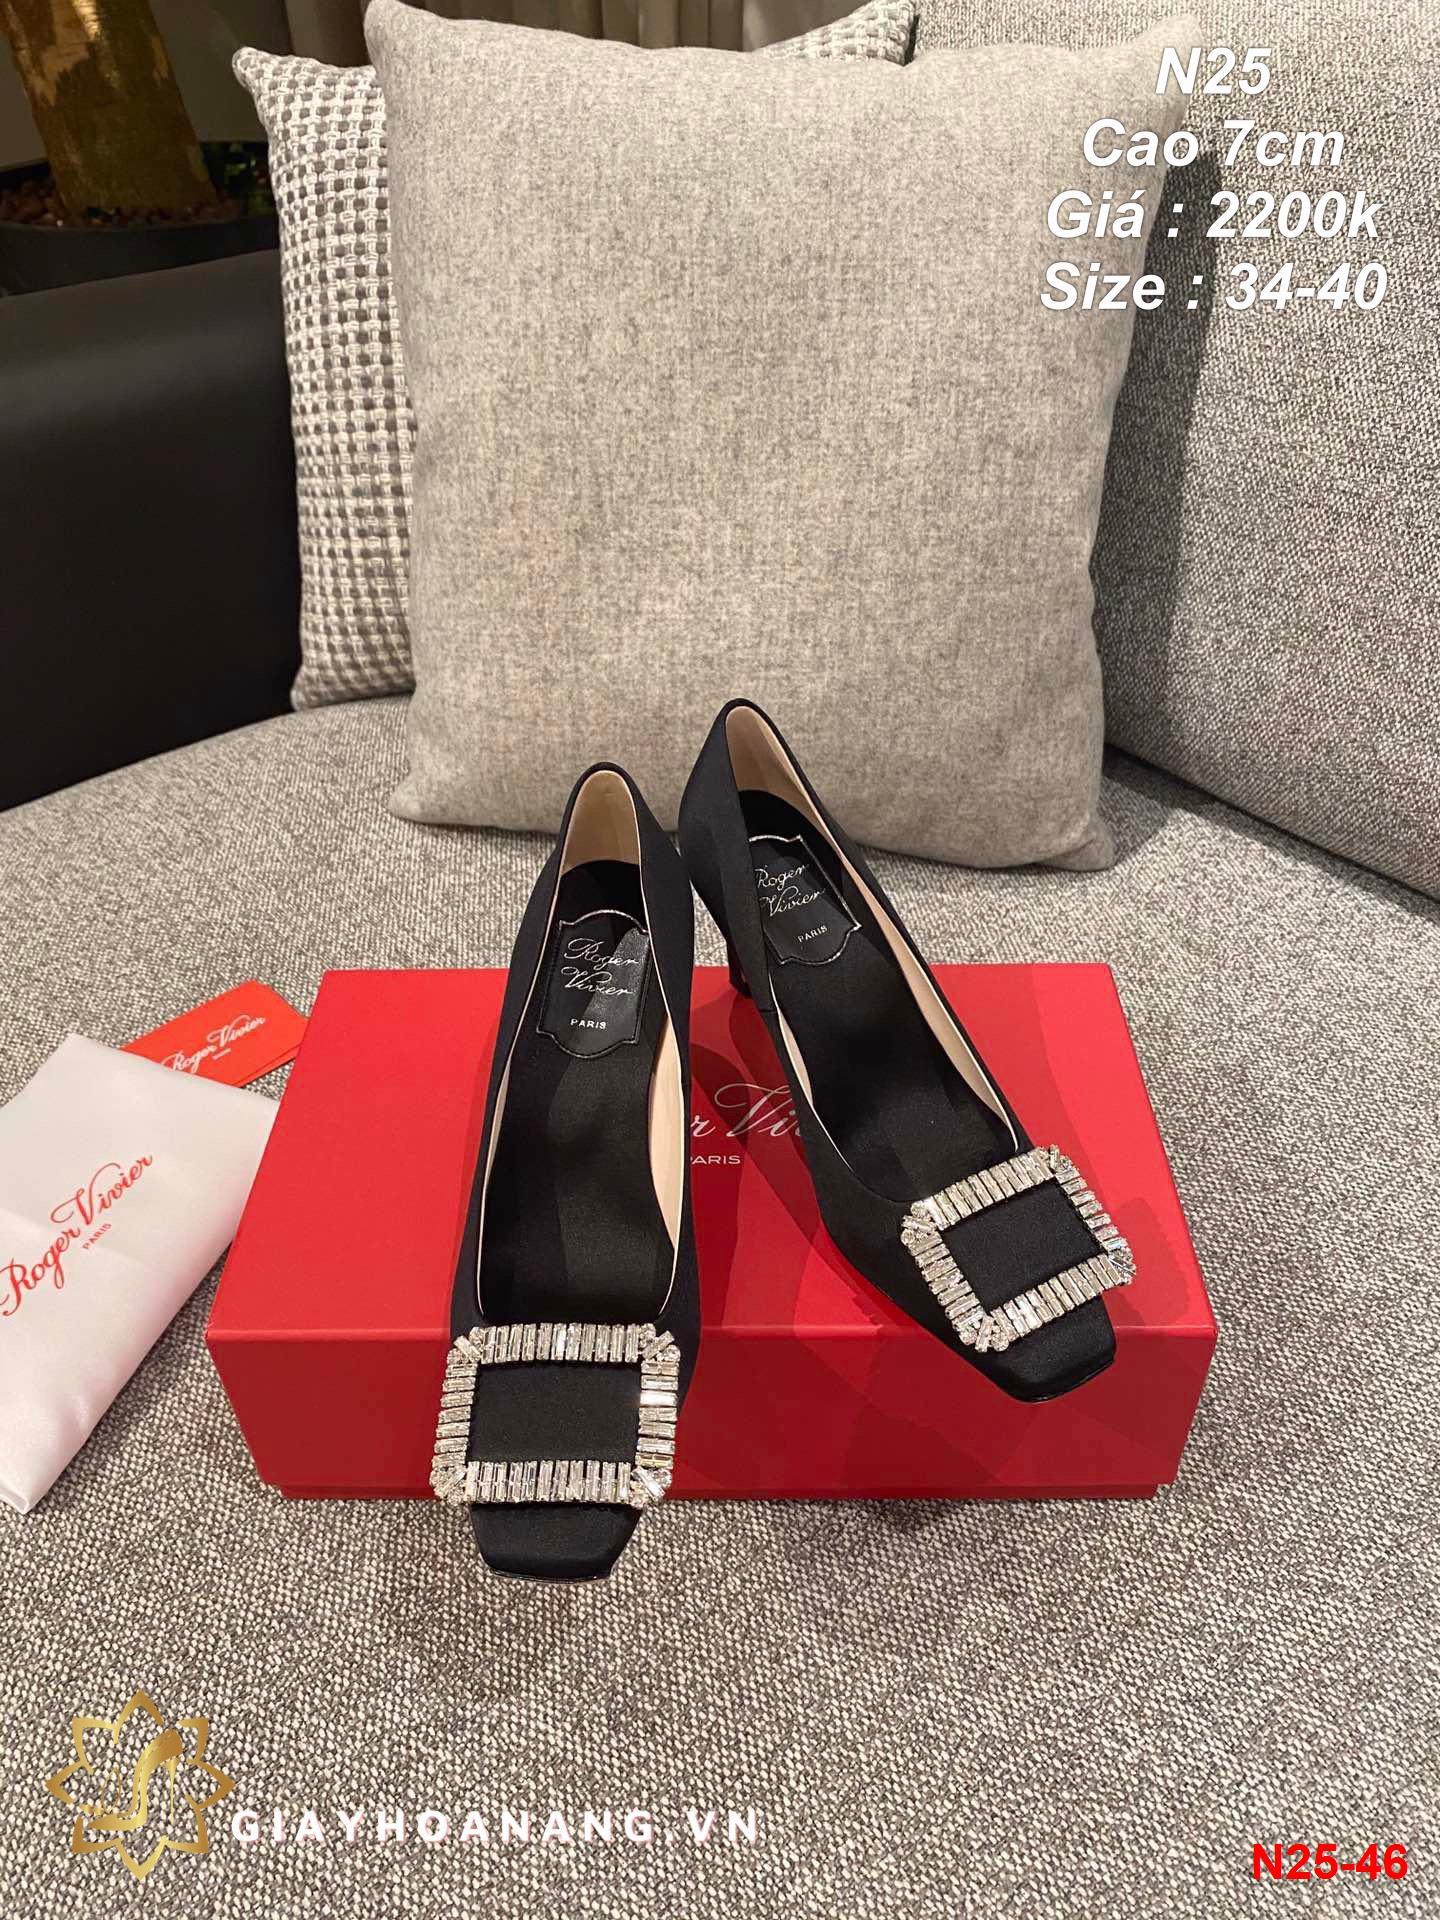 N25-46 Roger Vivier giày cao 7cm siêu cấp